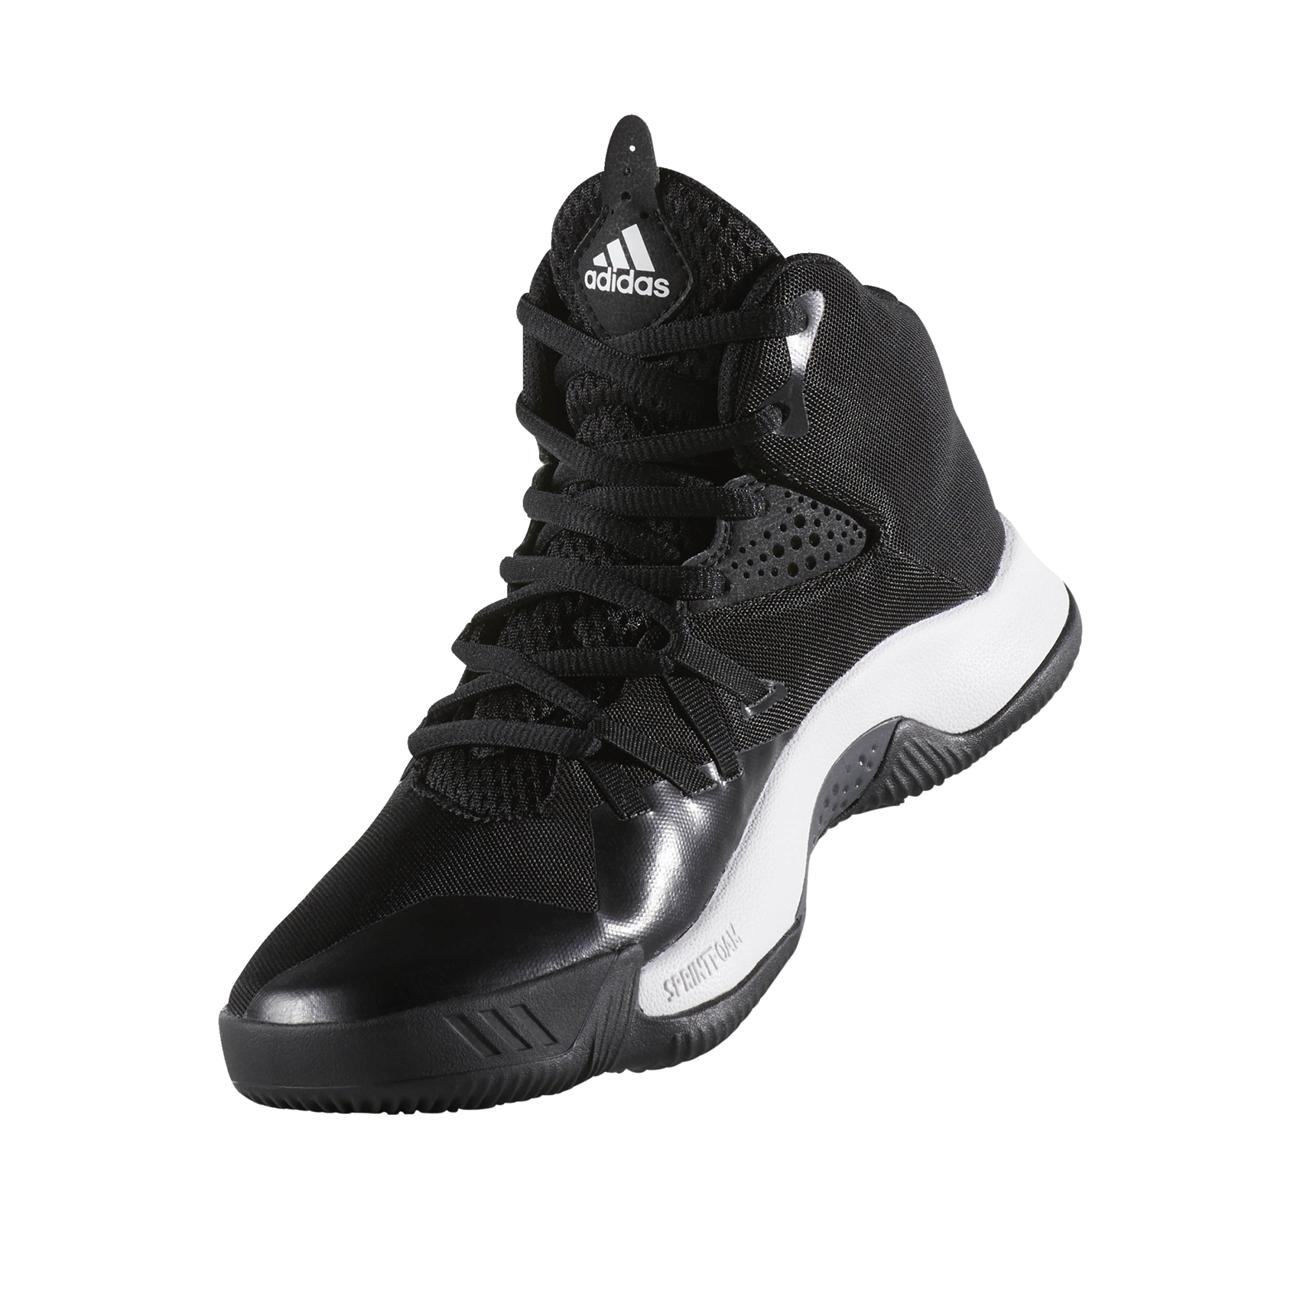 Adidas Dual Threat 2017 Junior (black white) 05707367d